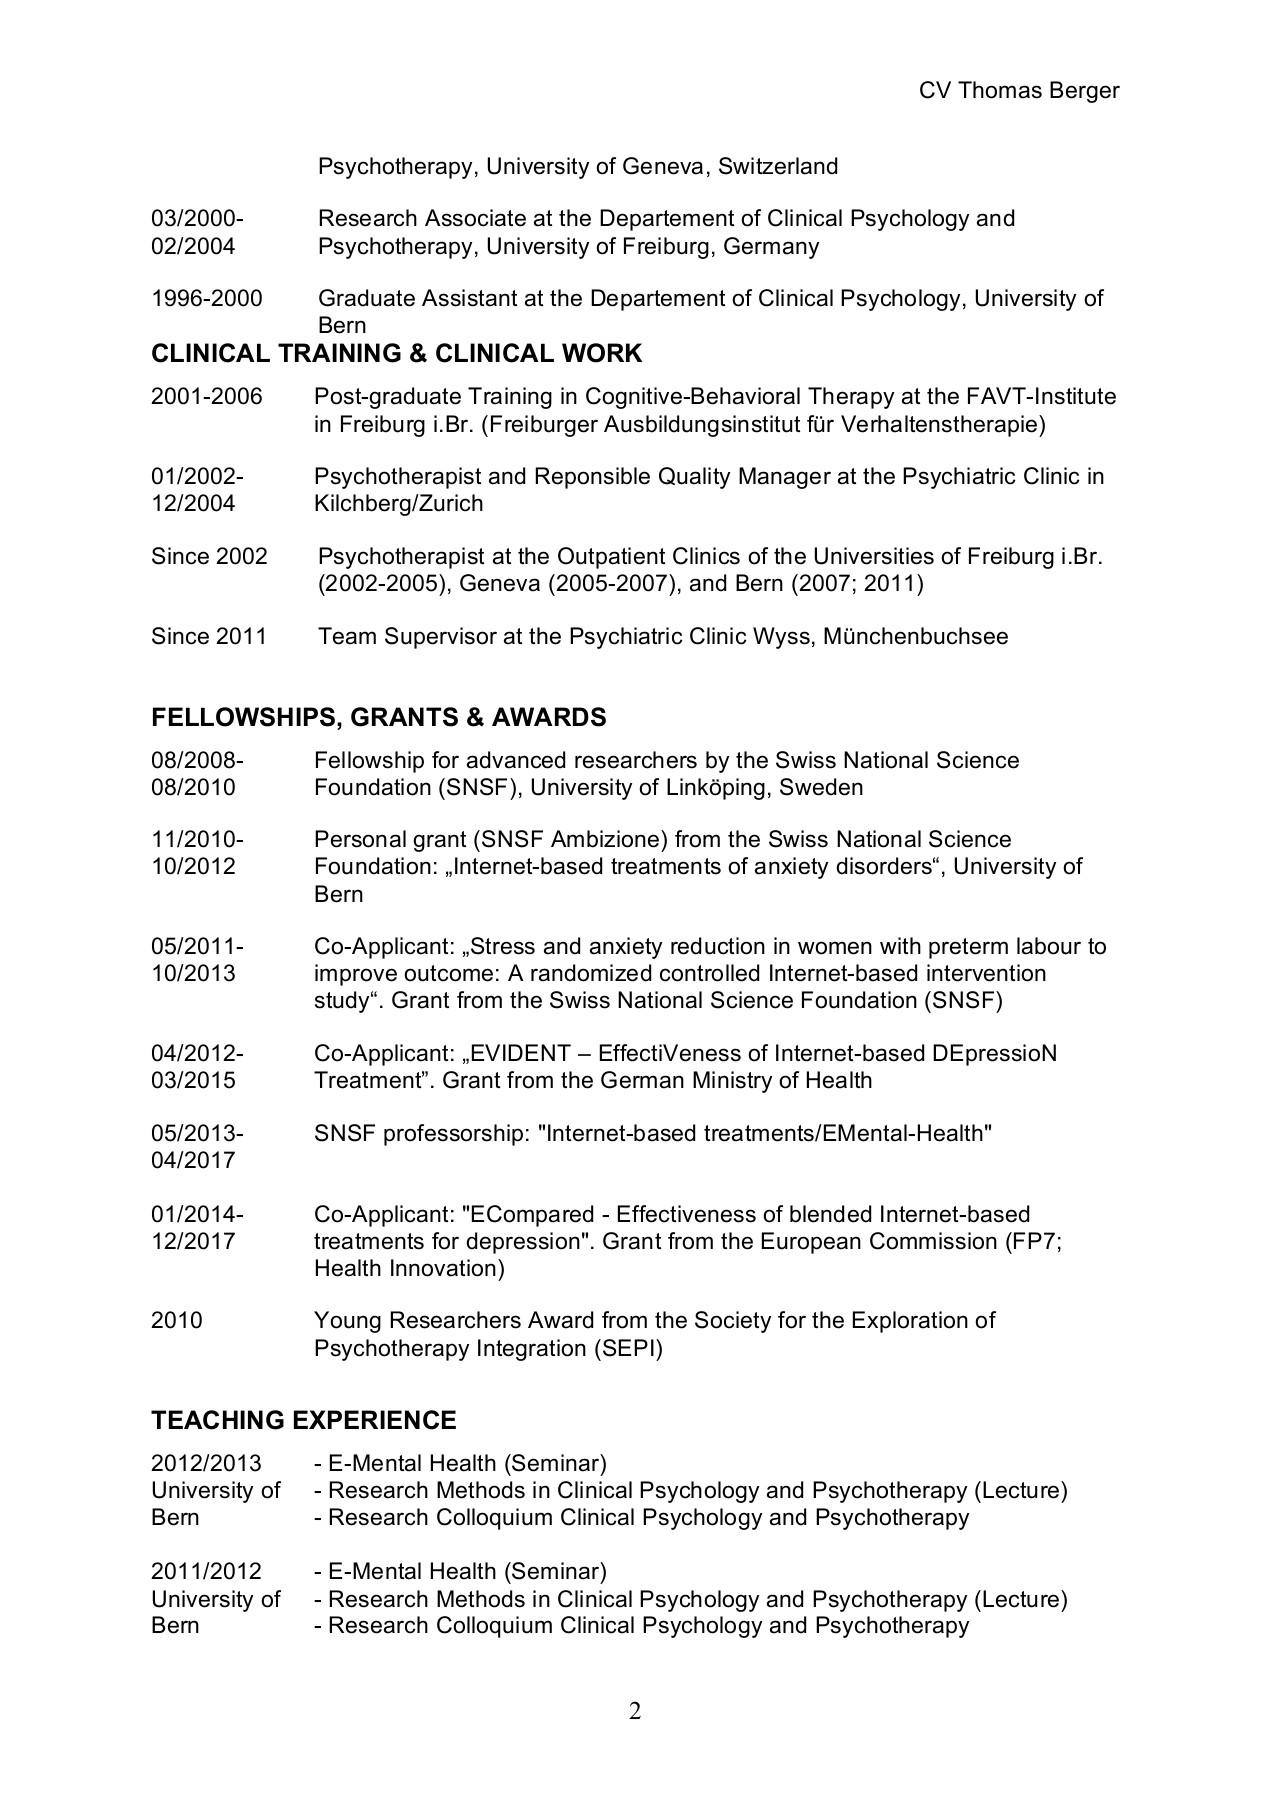 Curriculum Vitae Thomas Berger Snis Flip Ebook Pages 1 4 Anyflip Anyflip